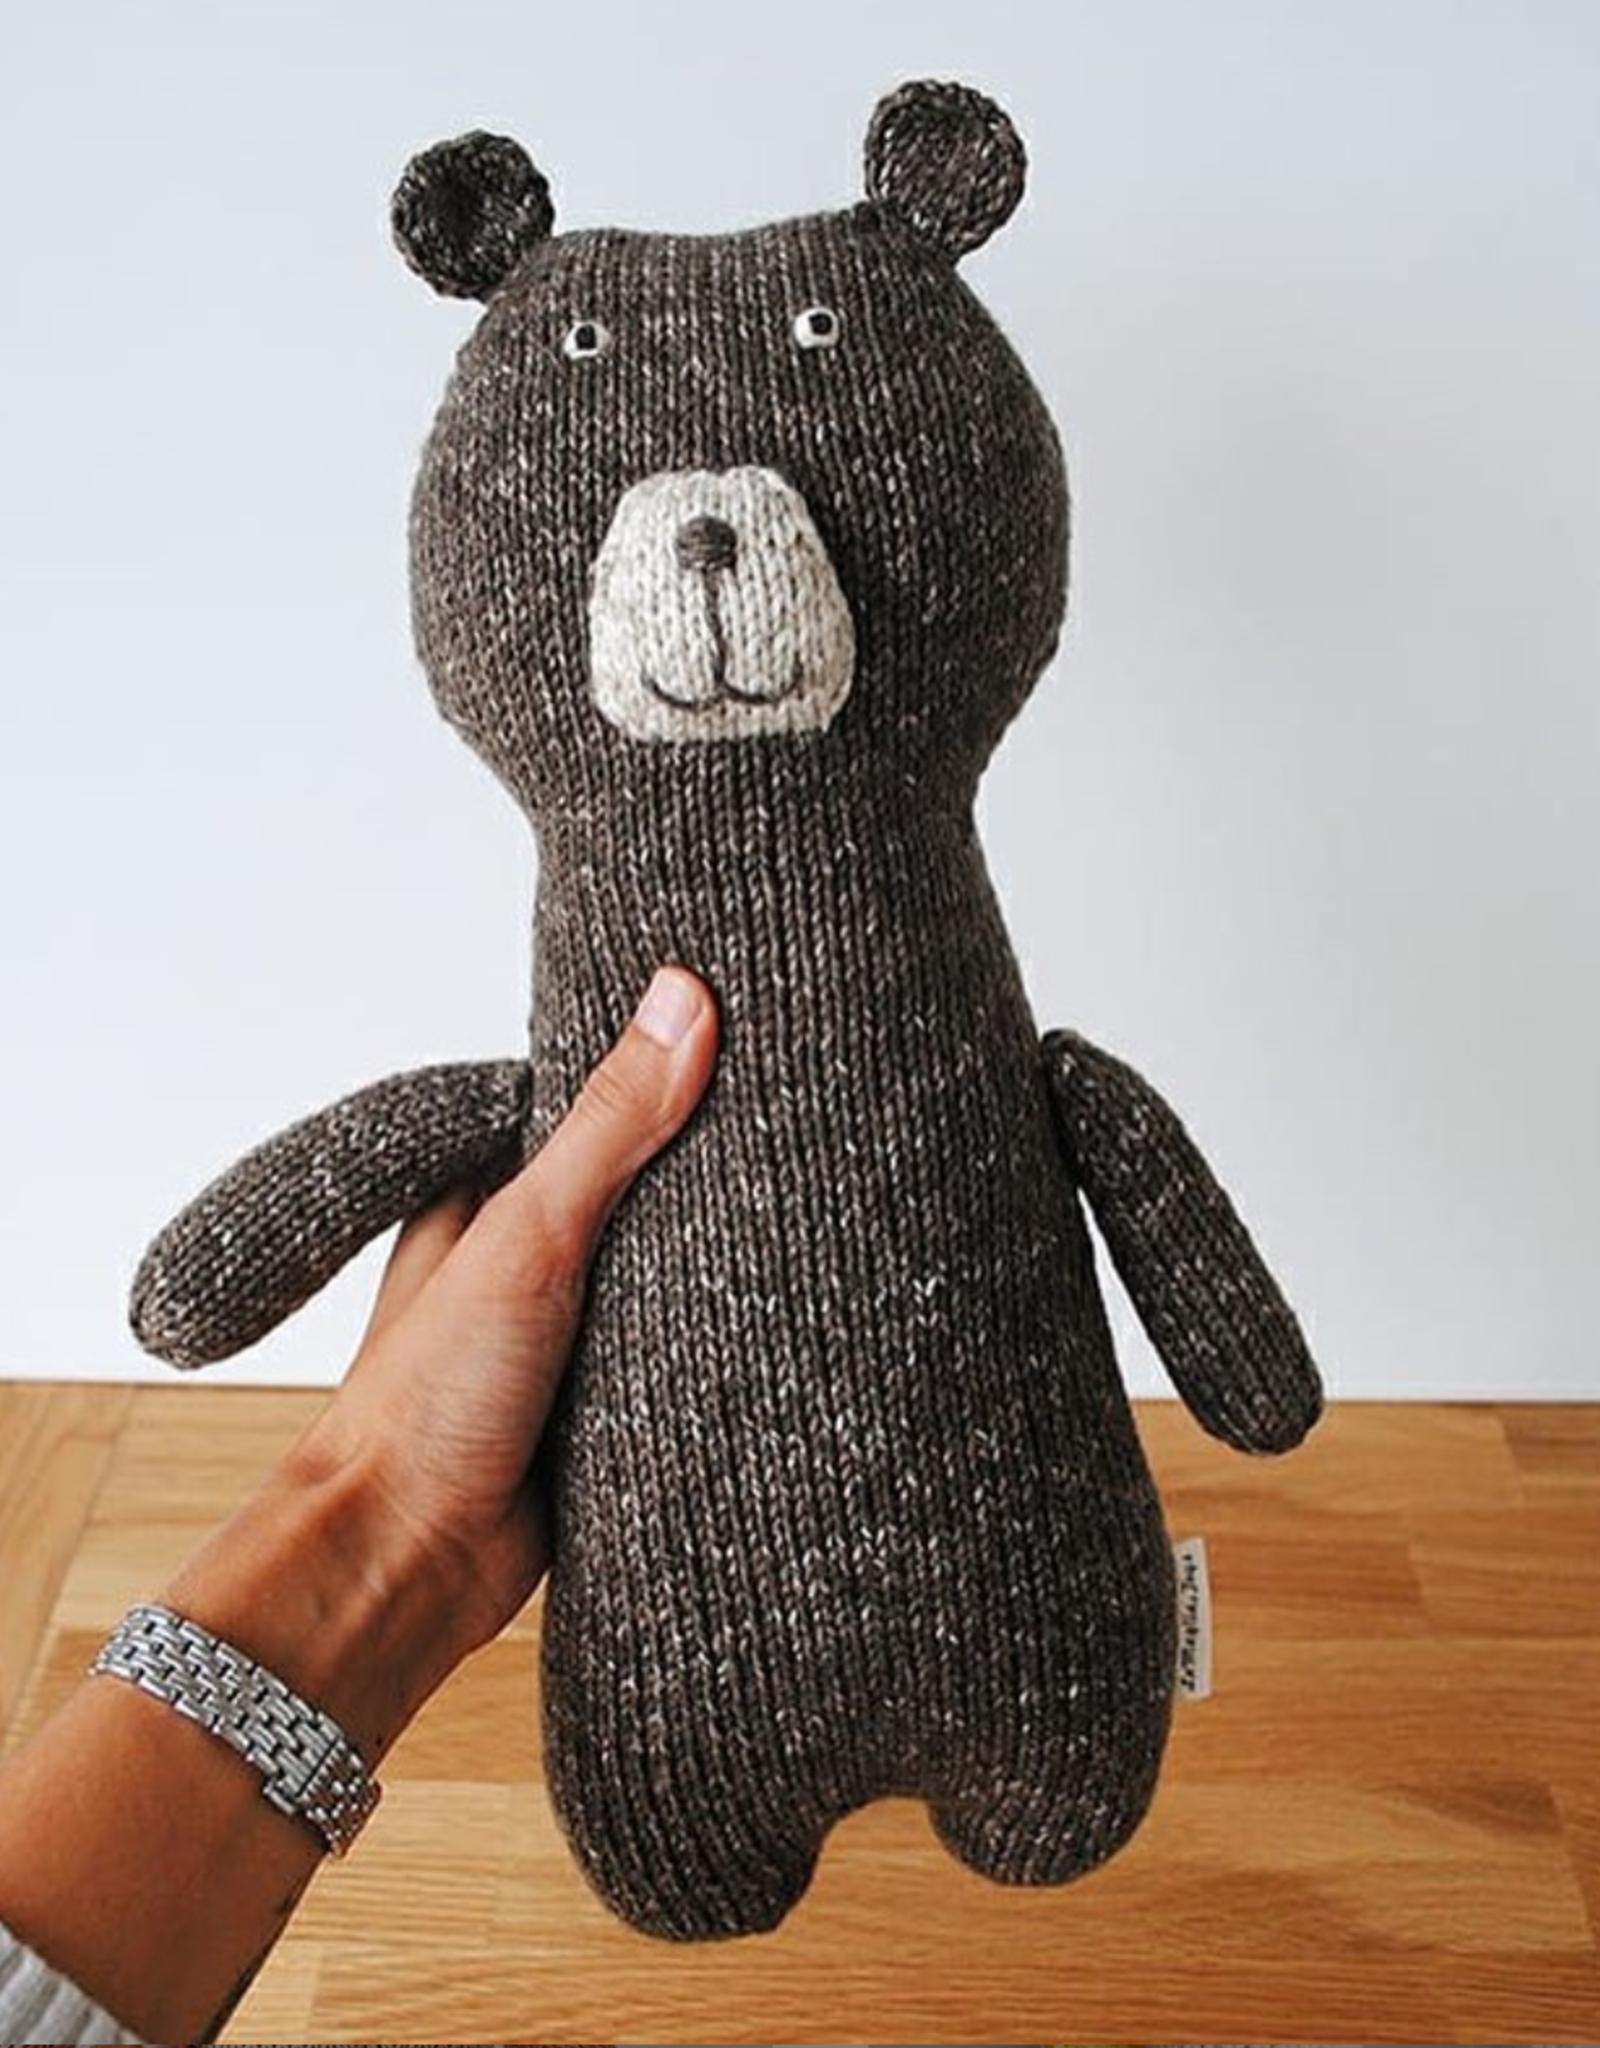 La Maglia toys Mishka the bear